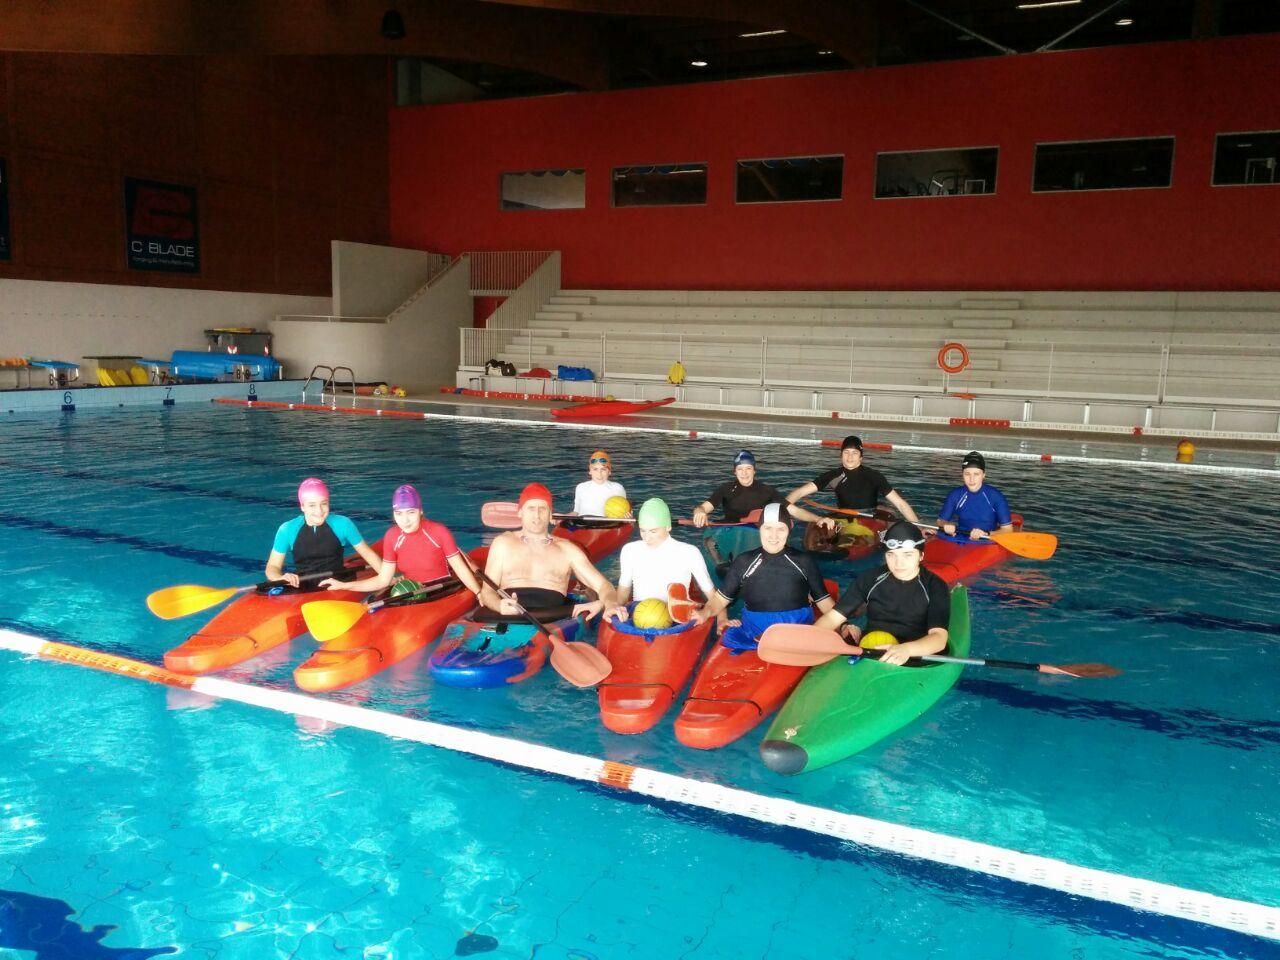 Canoa in piscina - Piscina di maniago ...